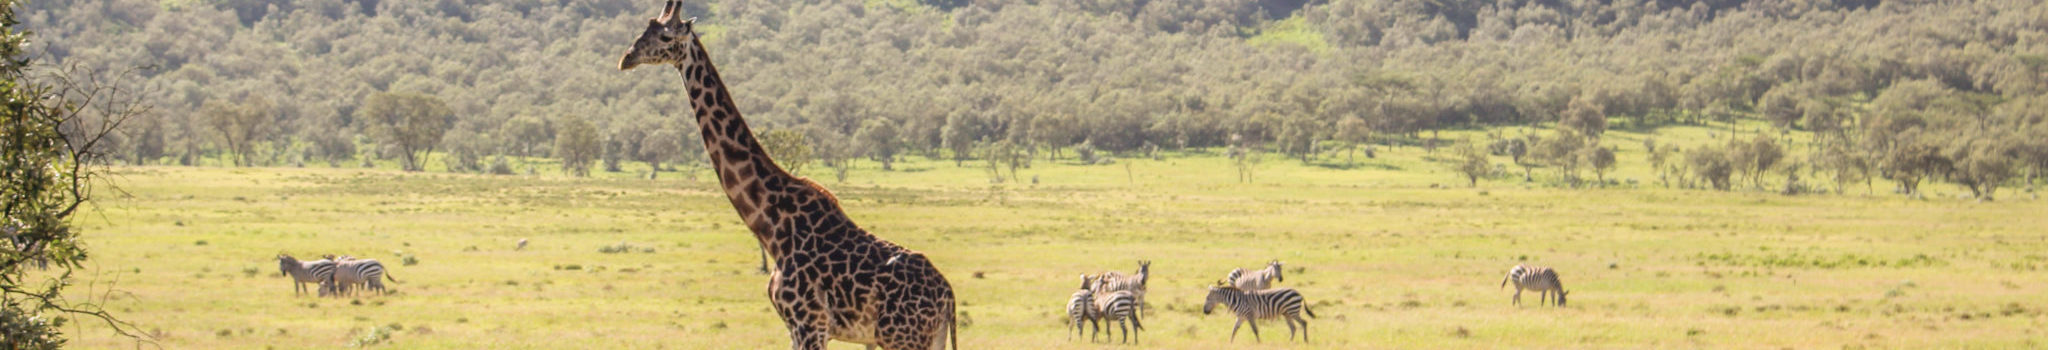 girafes zèbres trail